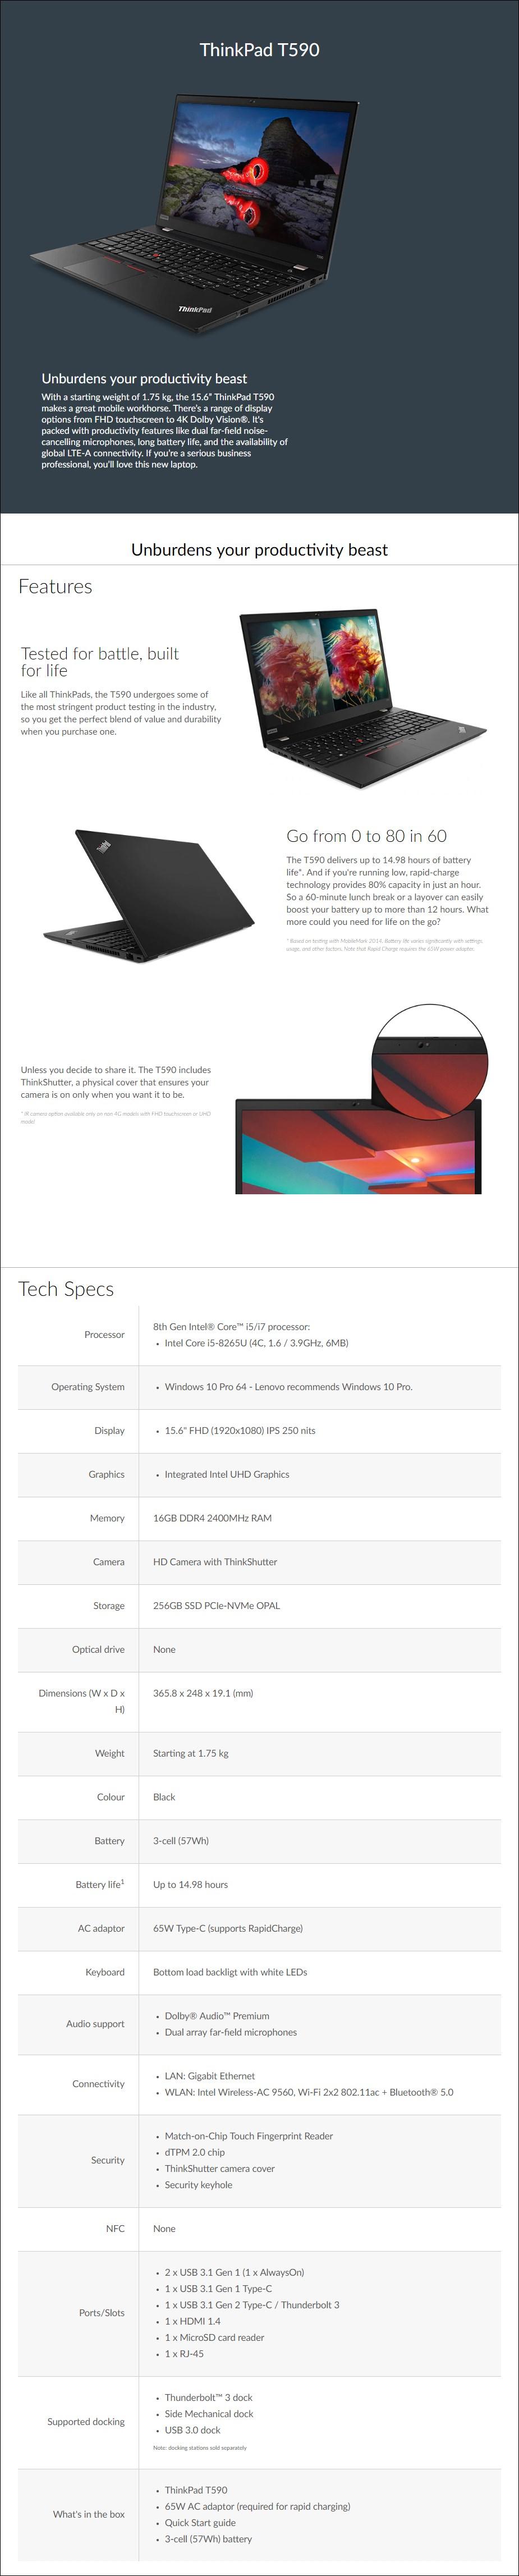 "Lenovo ThinkPad T590 15.6"" Laptop i5-8265U 16GB 256GB SSD W10P - Overview 1"